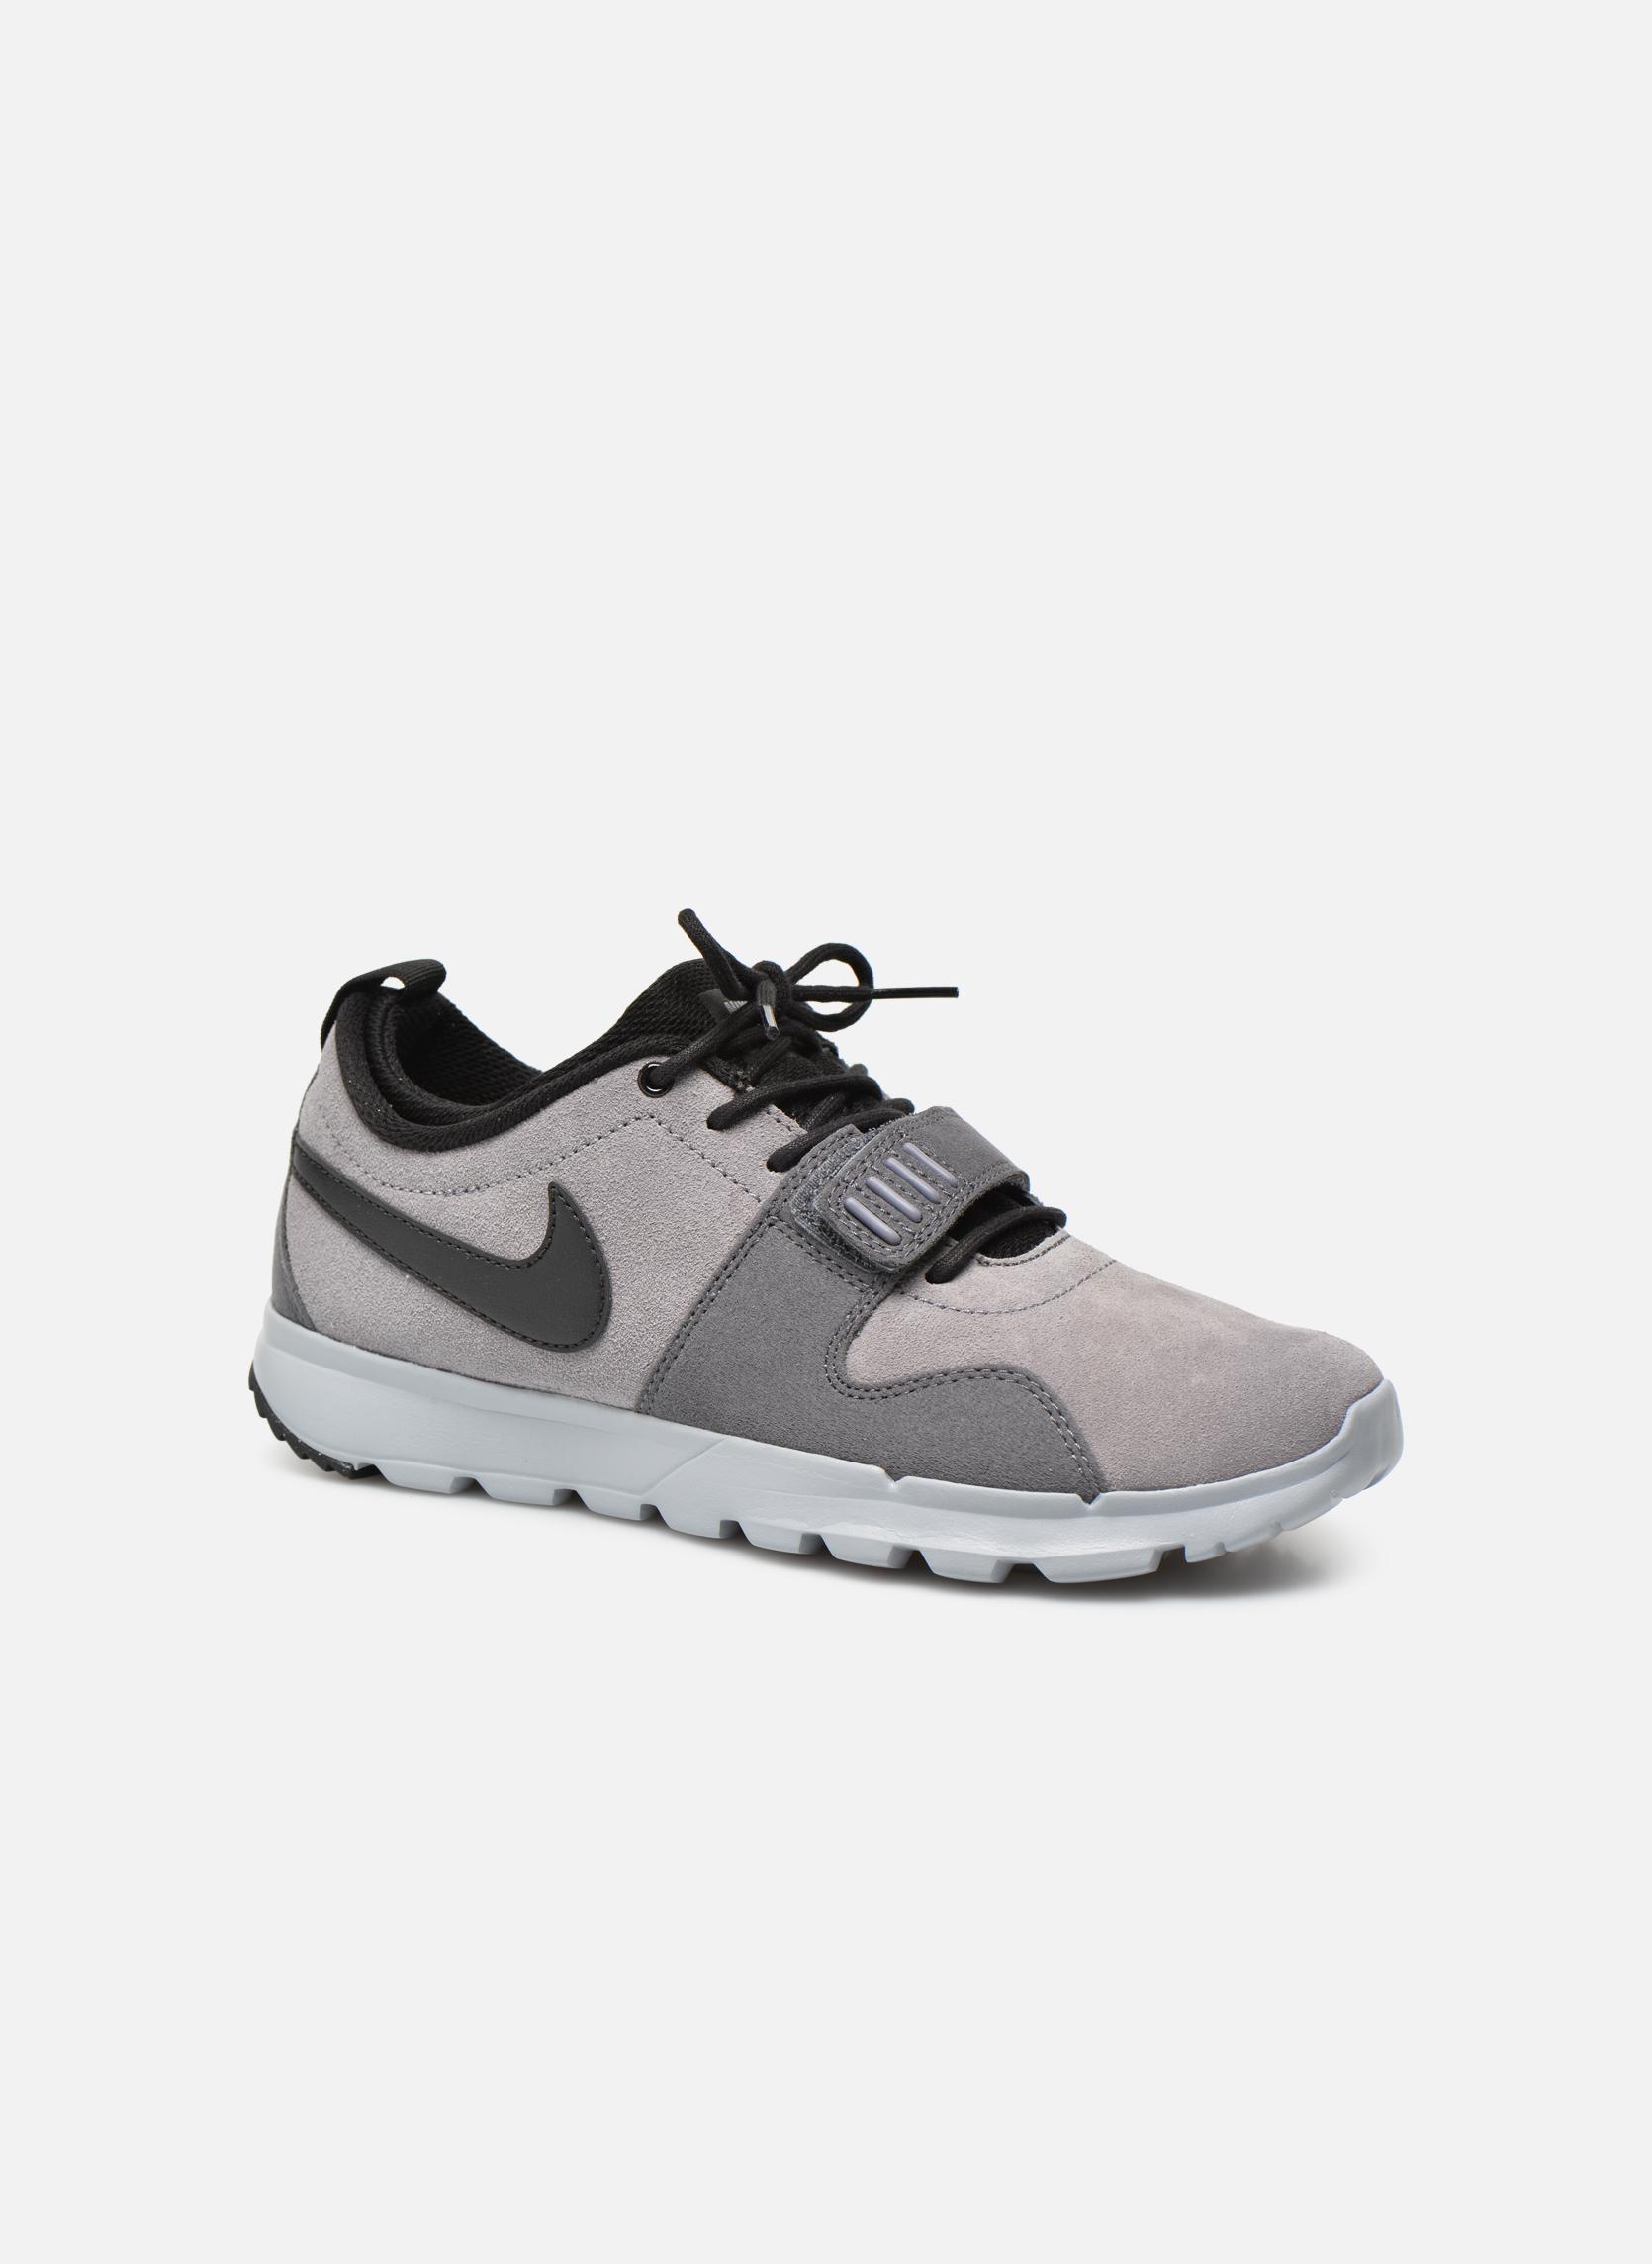 Nike Trainerendor L